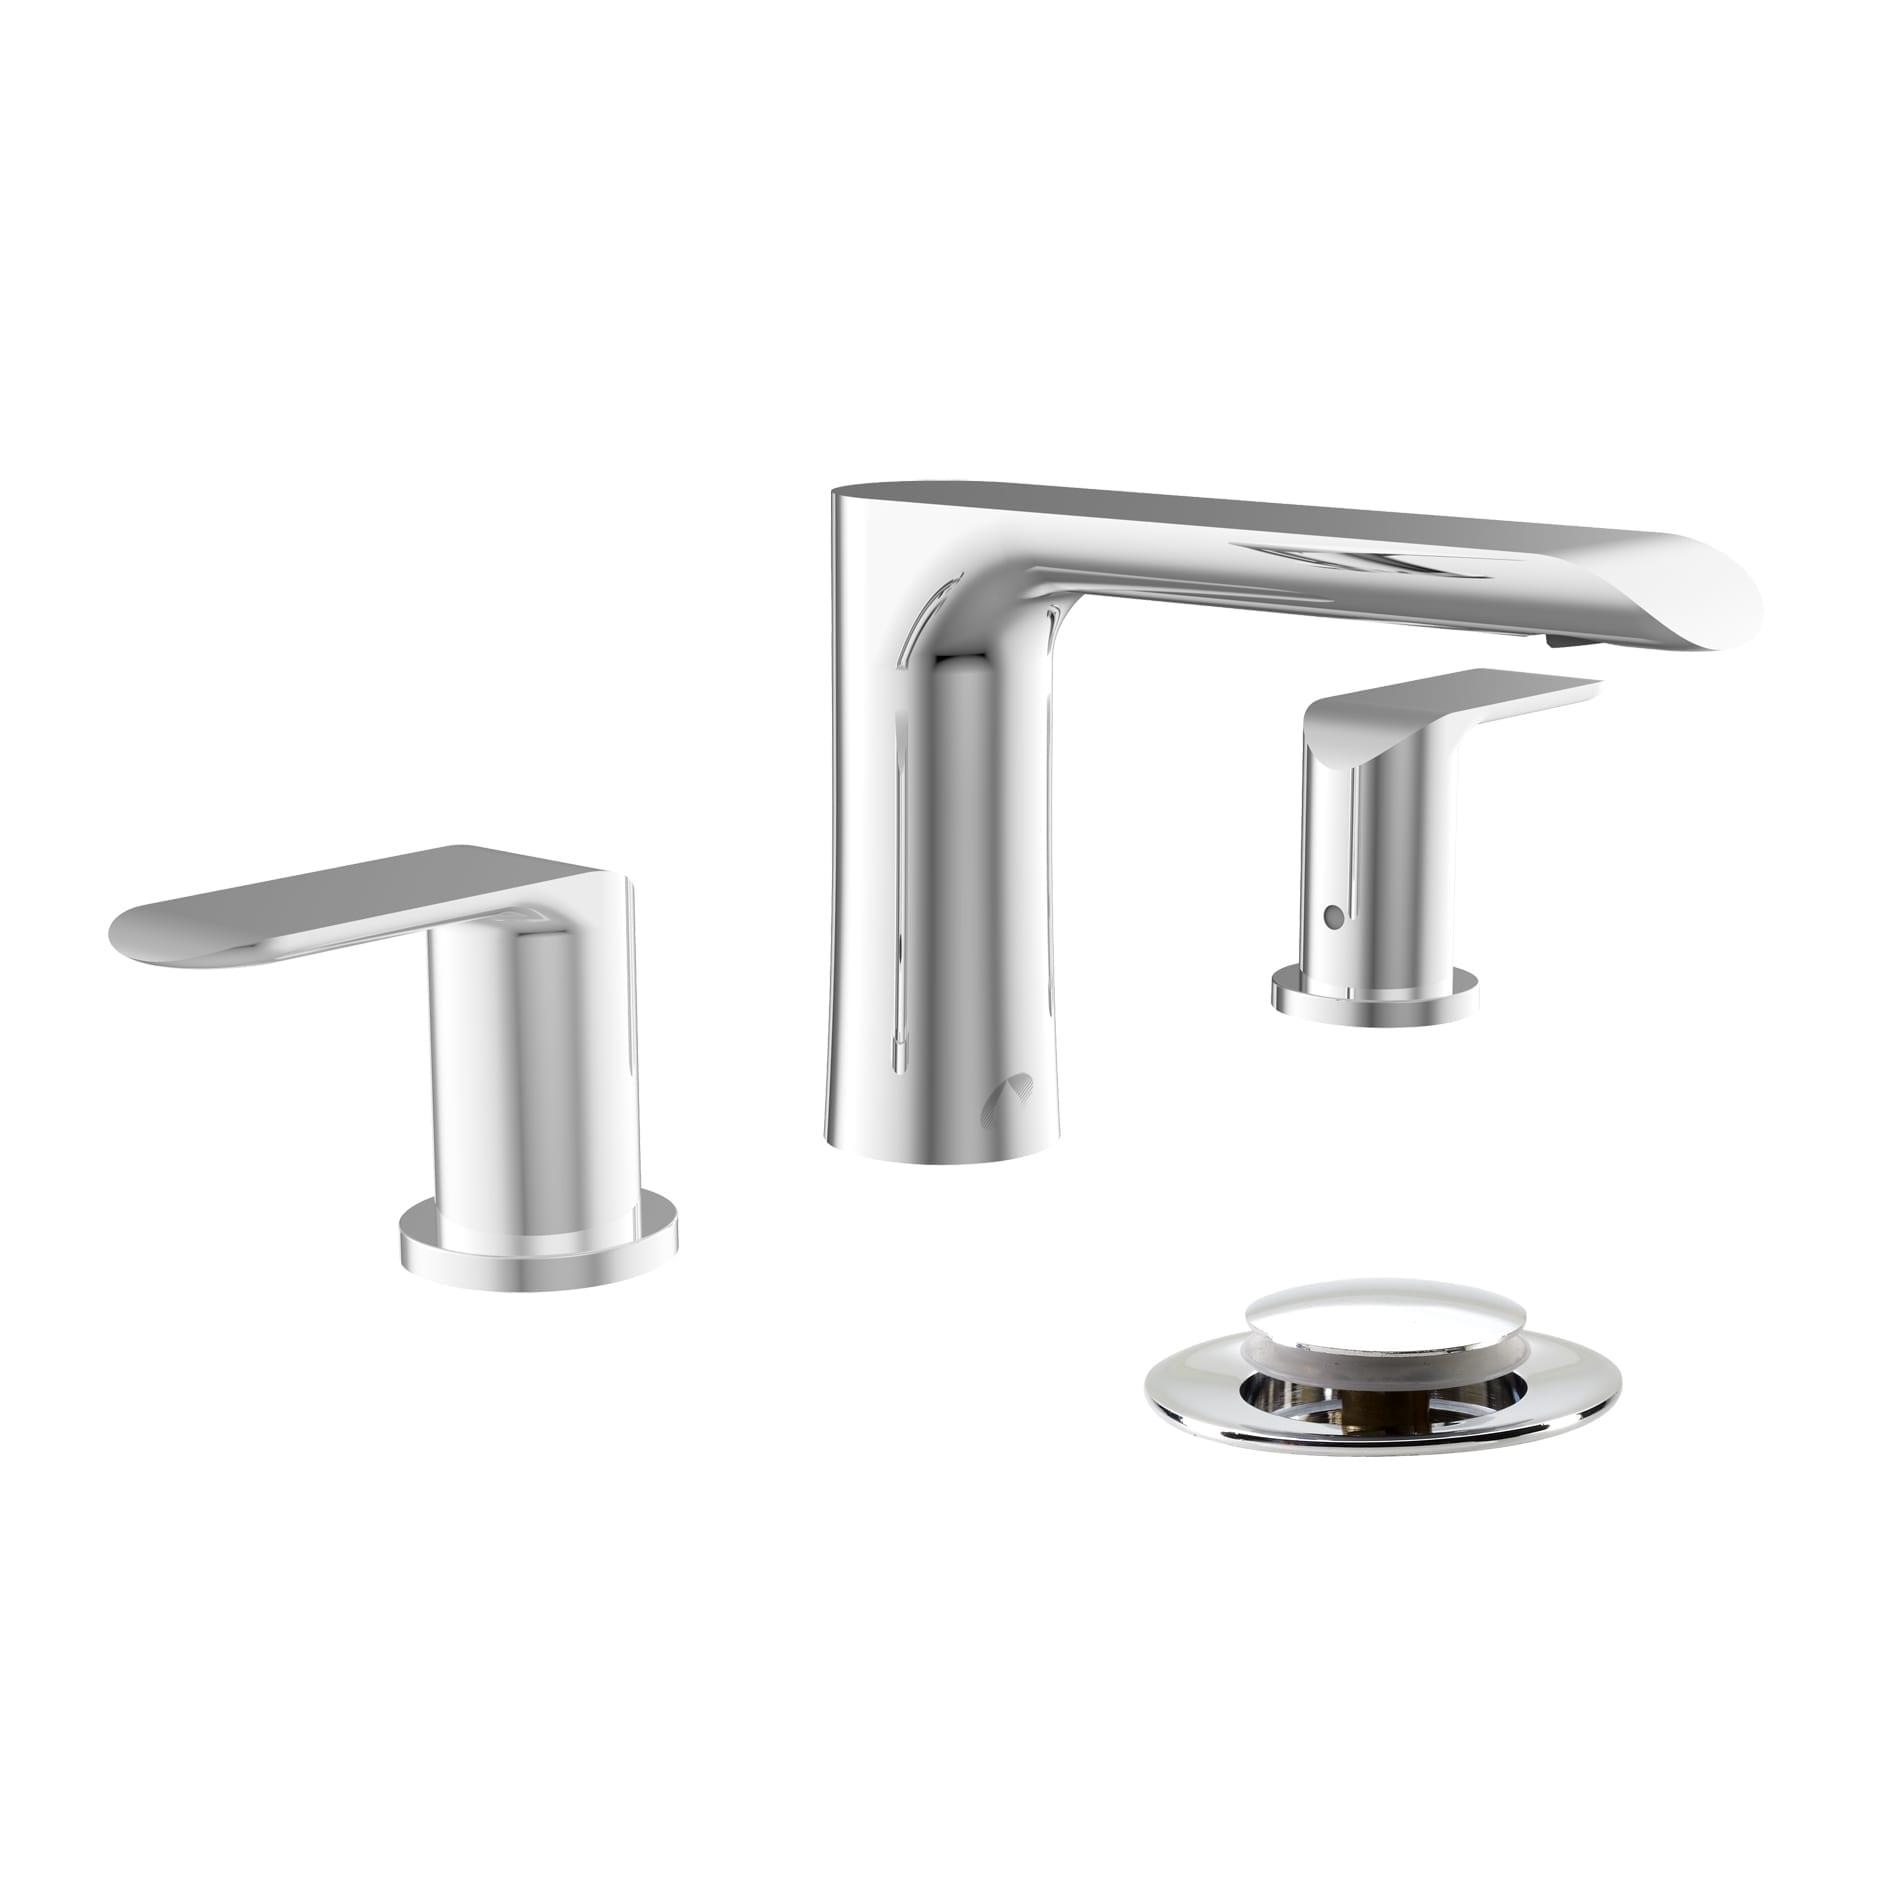 Brilliant Lavatory Sink Faucet With Swivel Aerator Belanger Upt Home Interior And Landscaping Ologienasavecom